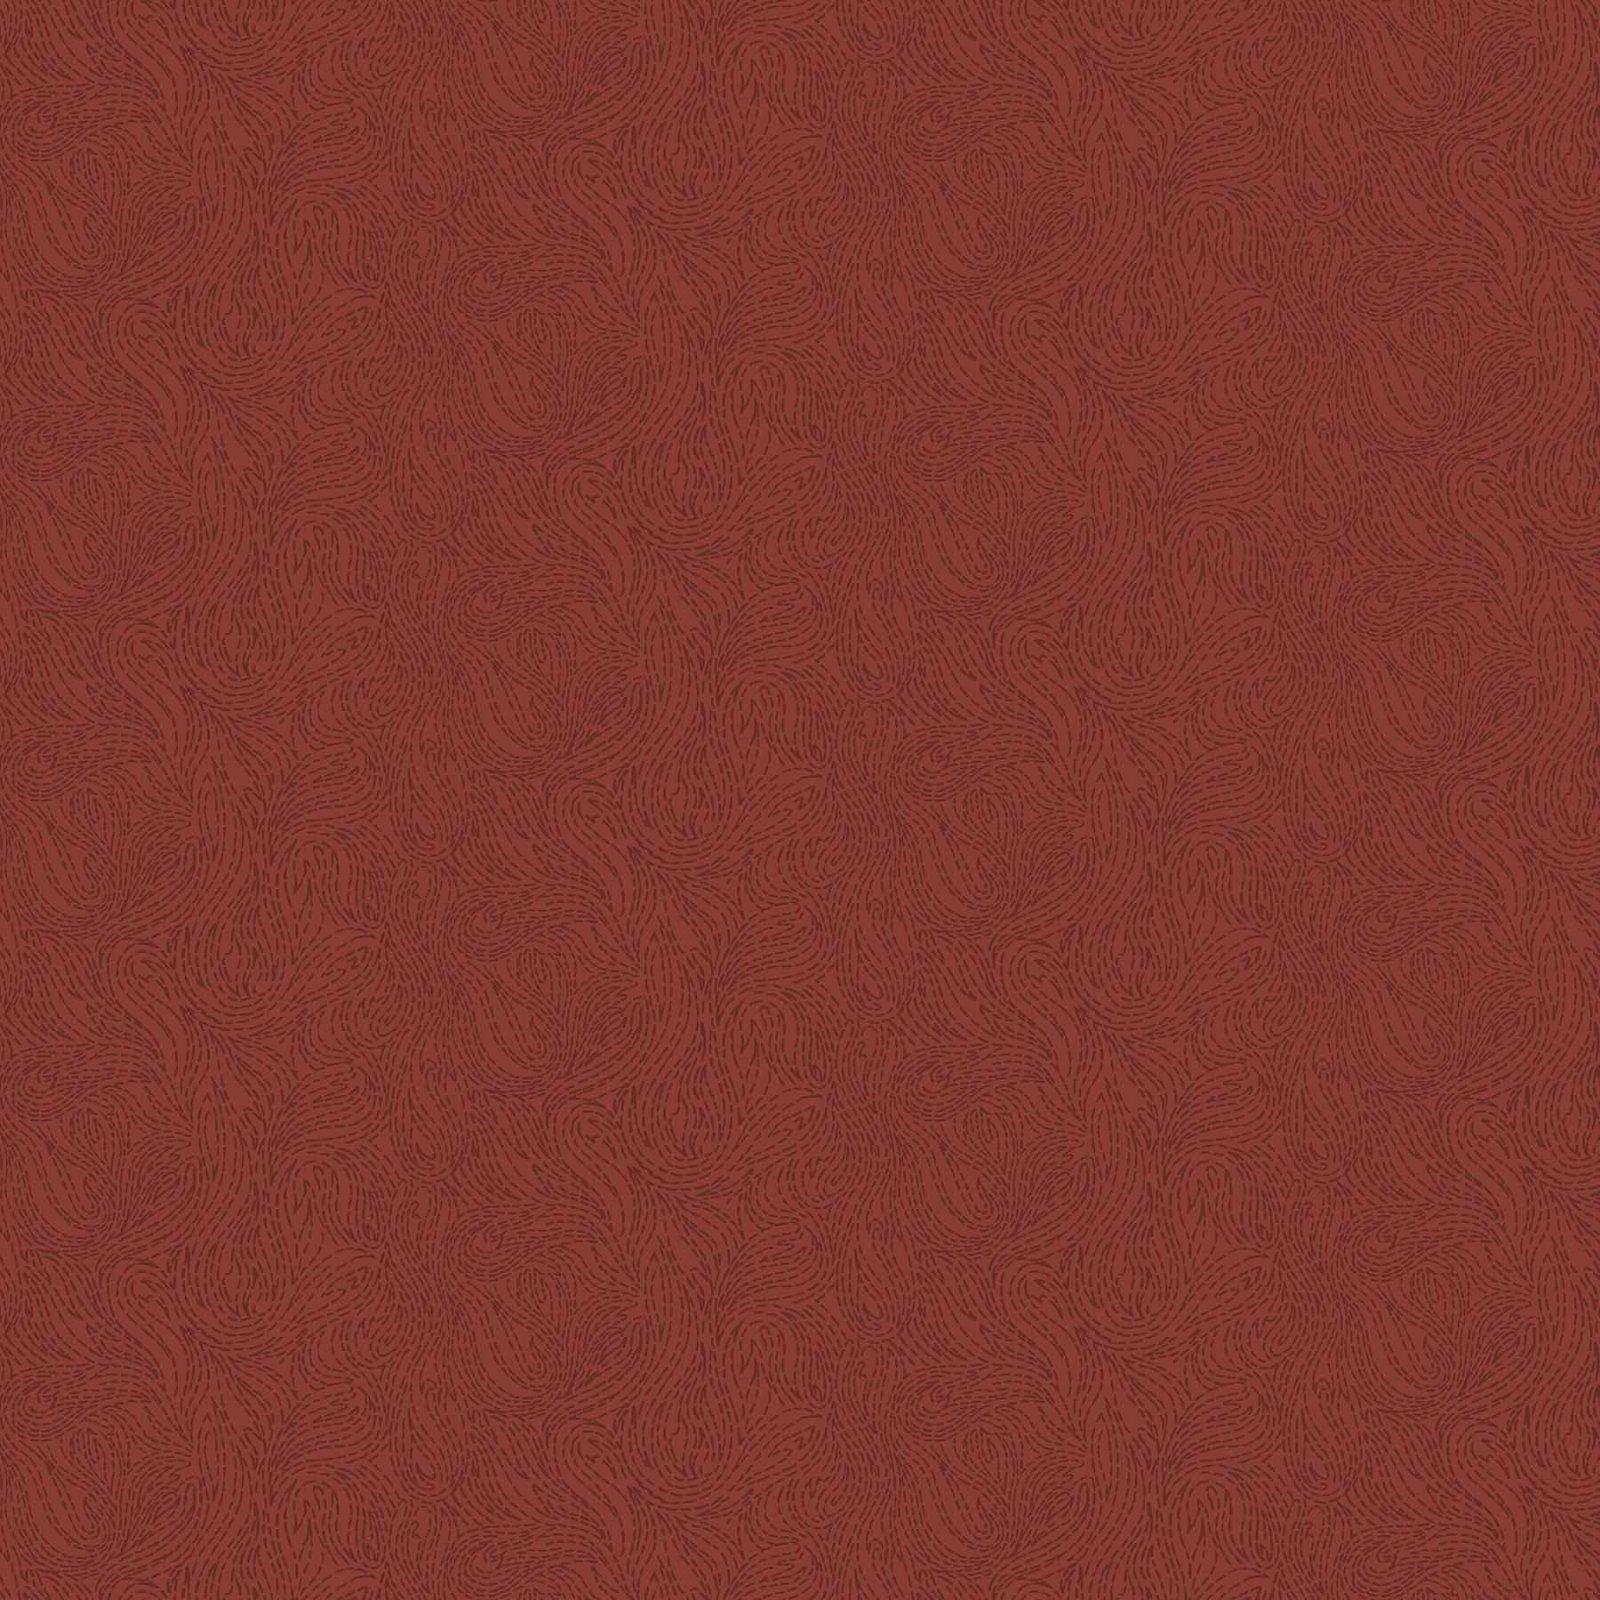 Elements by Ghazal Razavi - Fire - Brown